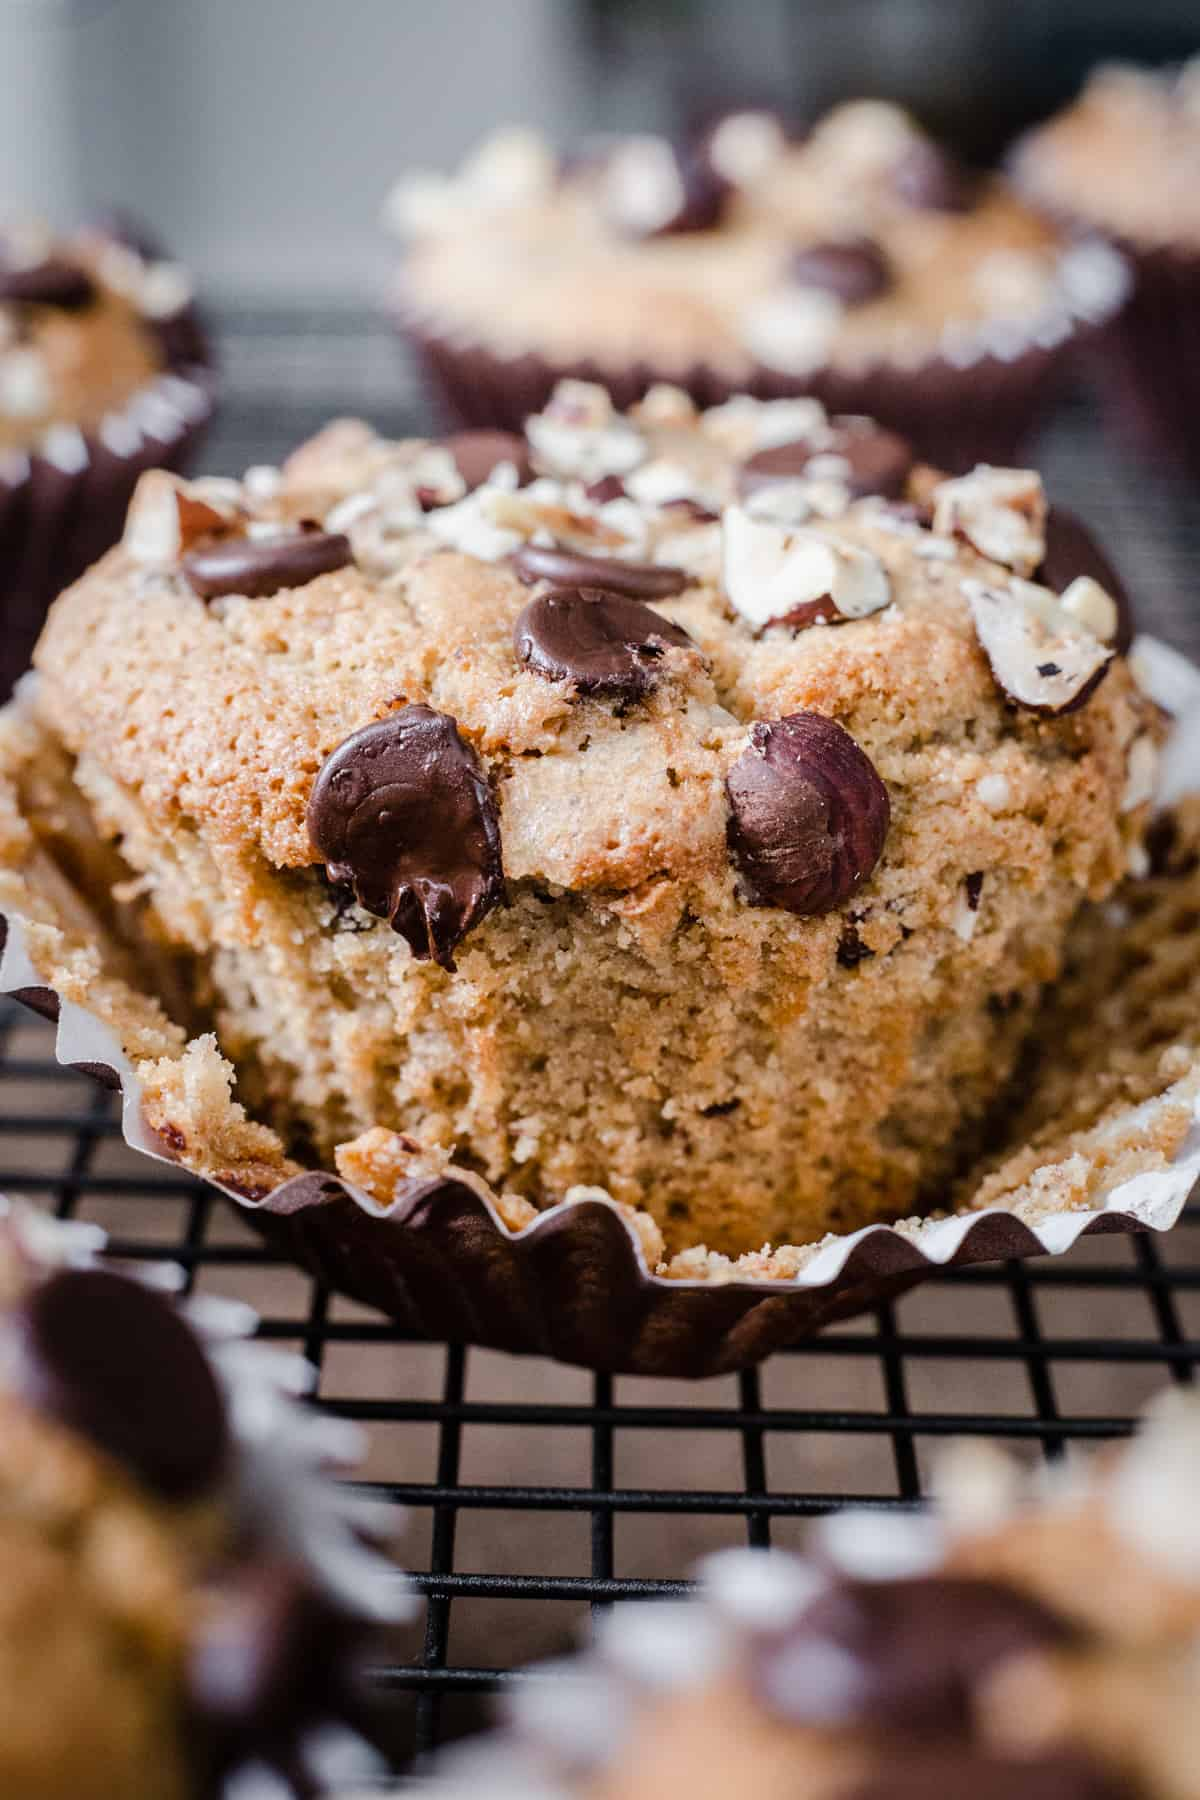 close up of Banana Chocolate Chip Muffin